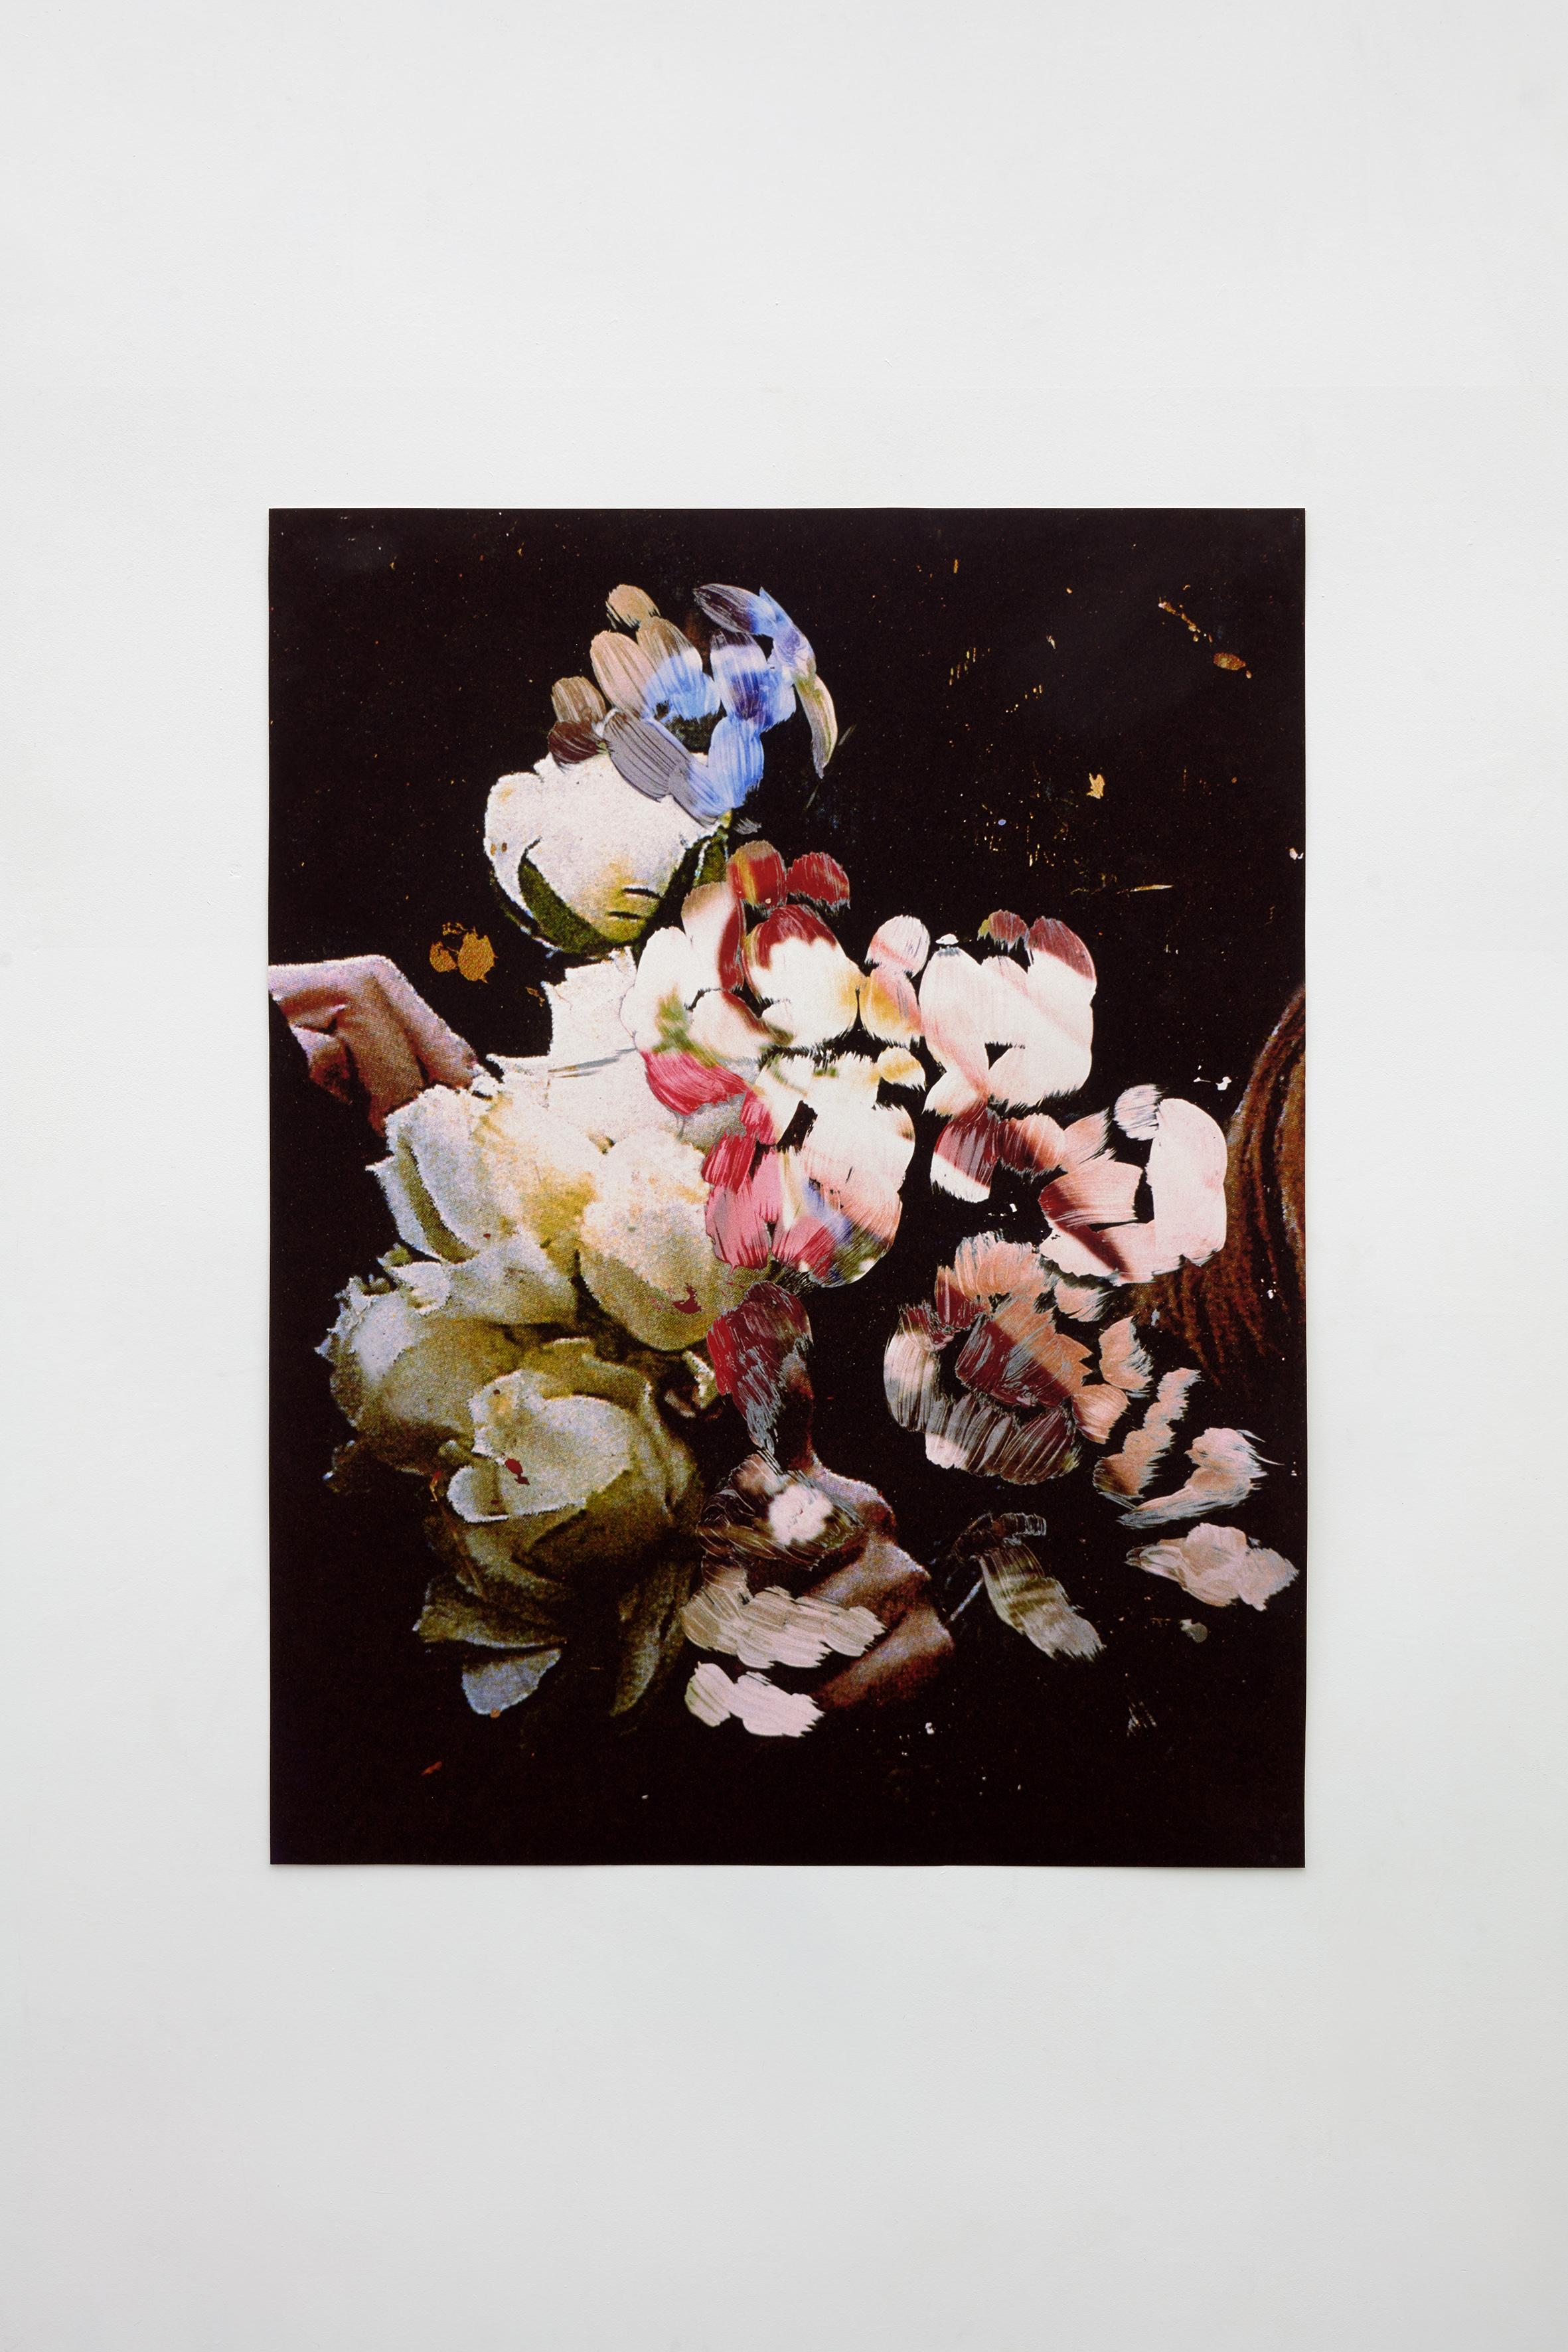 Rose in the Dark  2018  101x134cm  pigment print on german etching paper